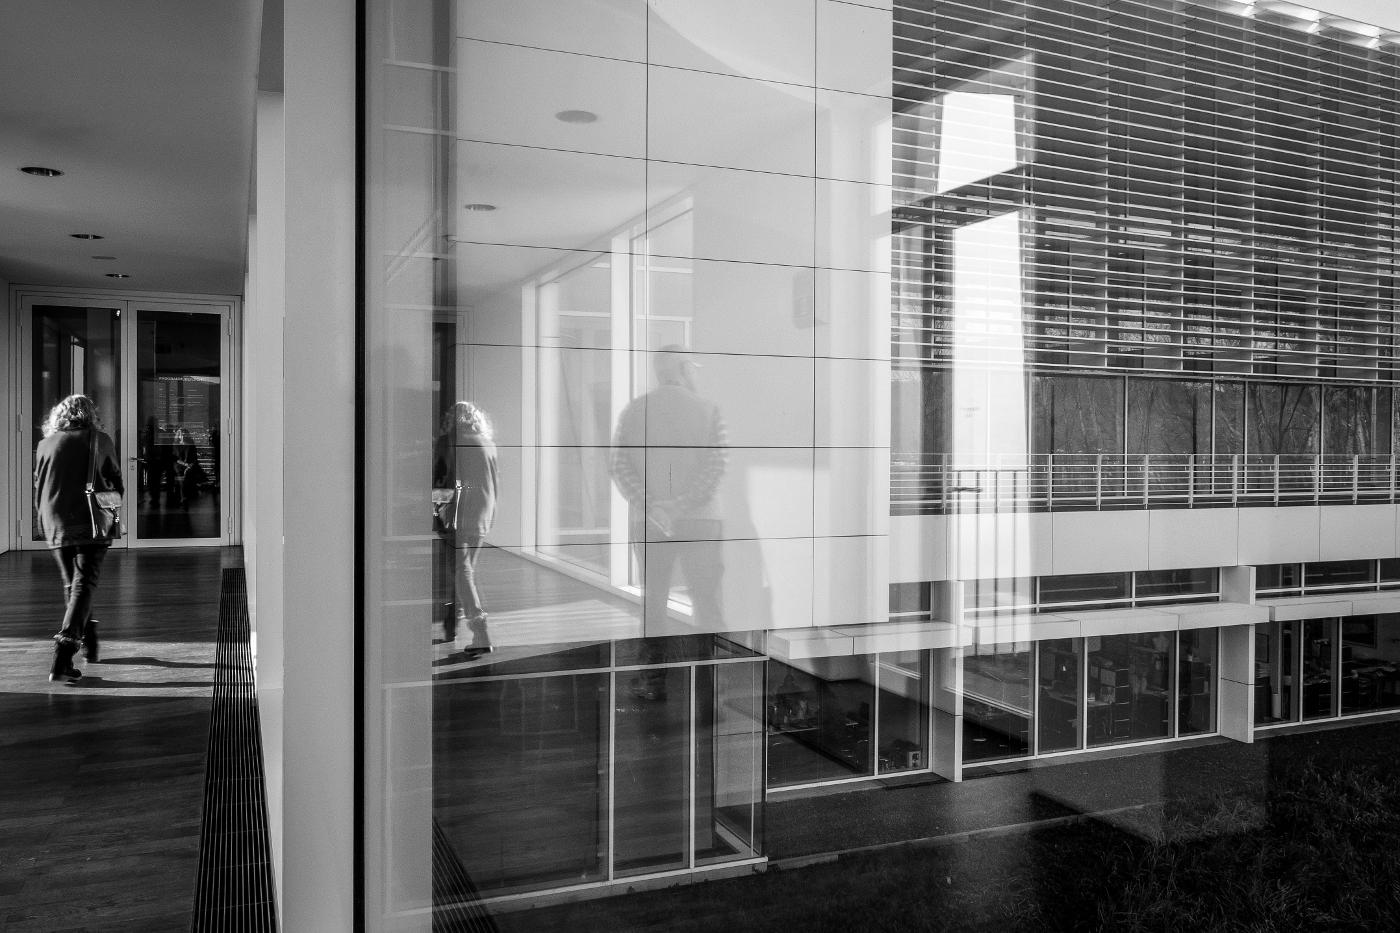 Arp Museum | Neubau 2007 des Architekten Richard Meier  | © wolfgang röser | worobo